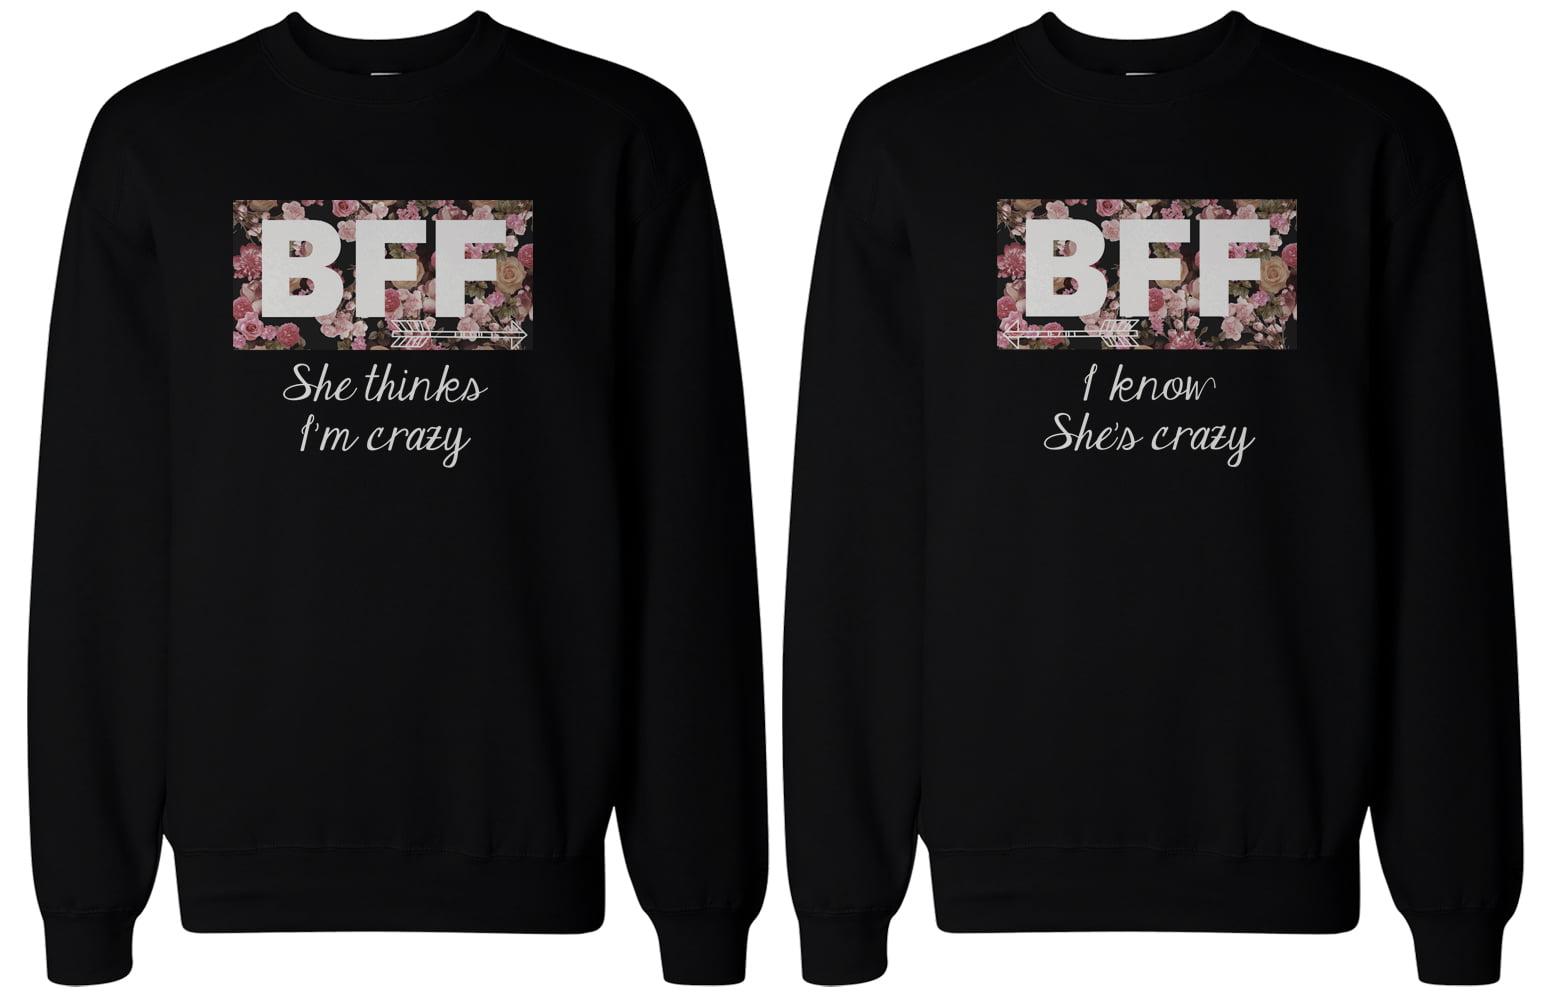 Best Friend Shirts For 2 - T Shirts Design Concept